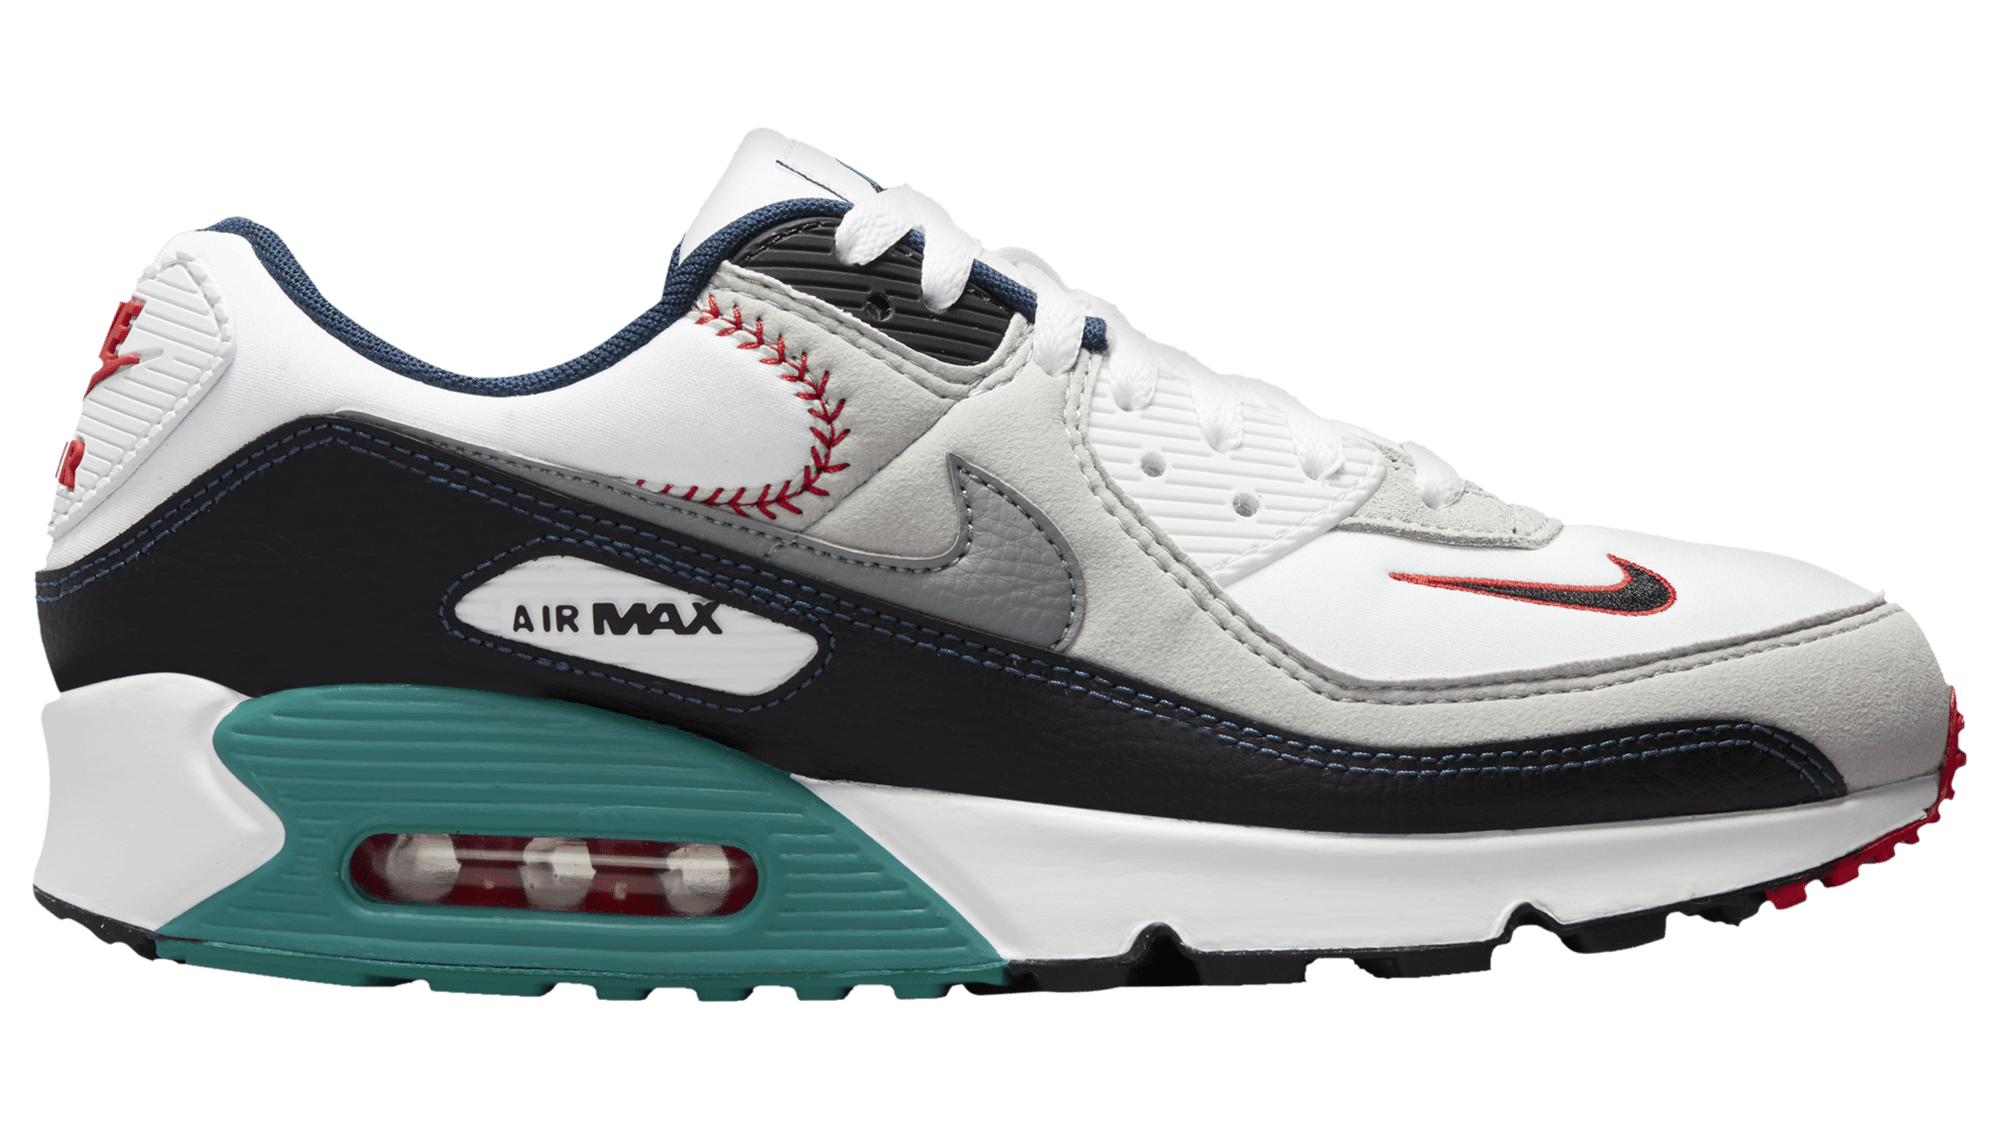 Nike Air Max 90 'OG Flipped' CD5190-101 Lateral